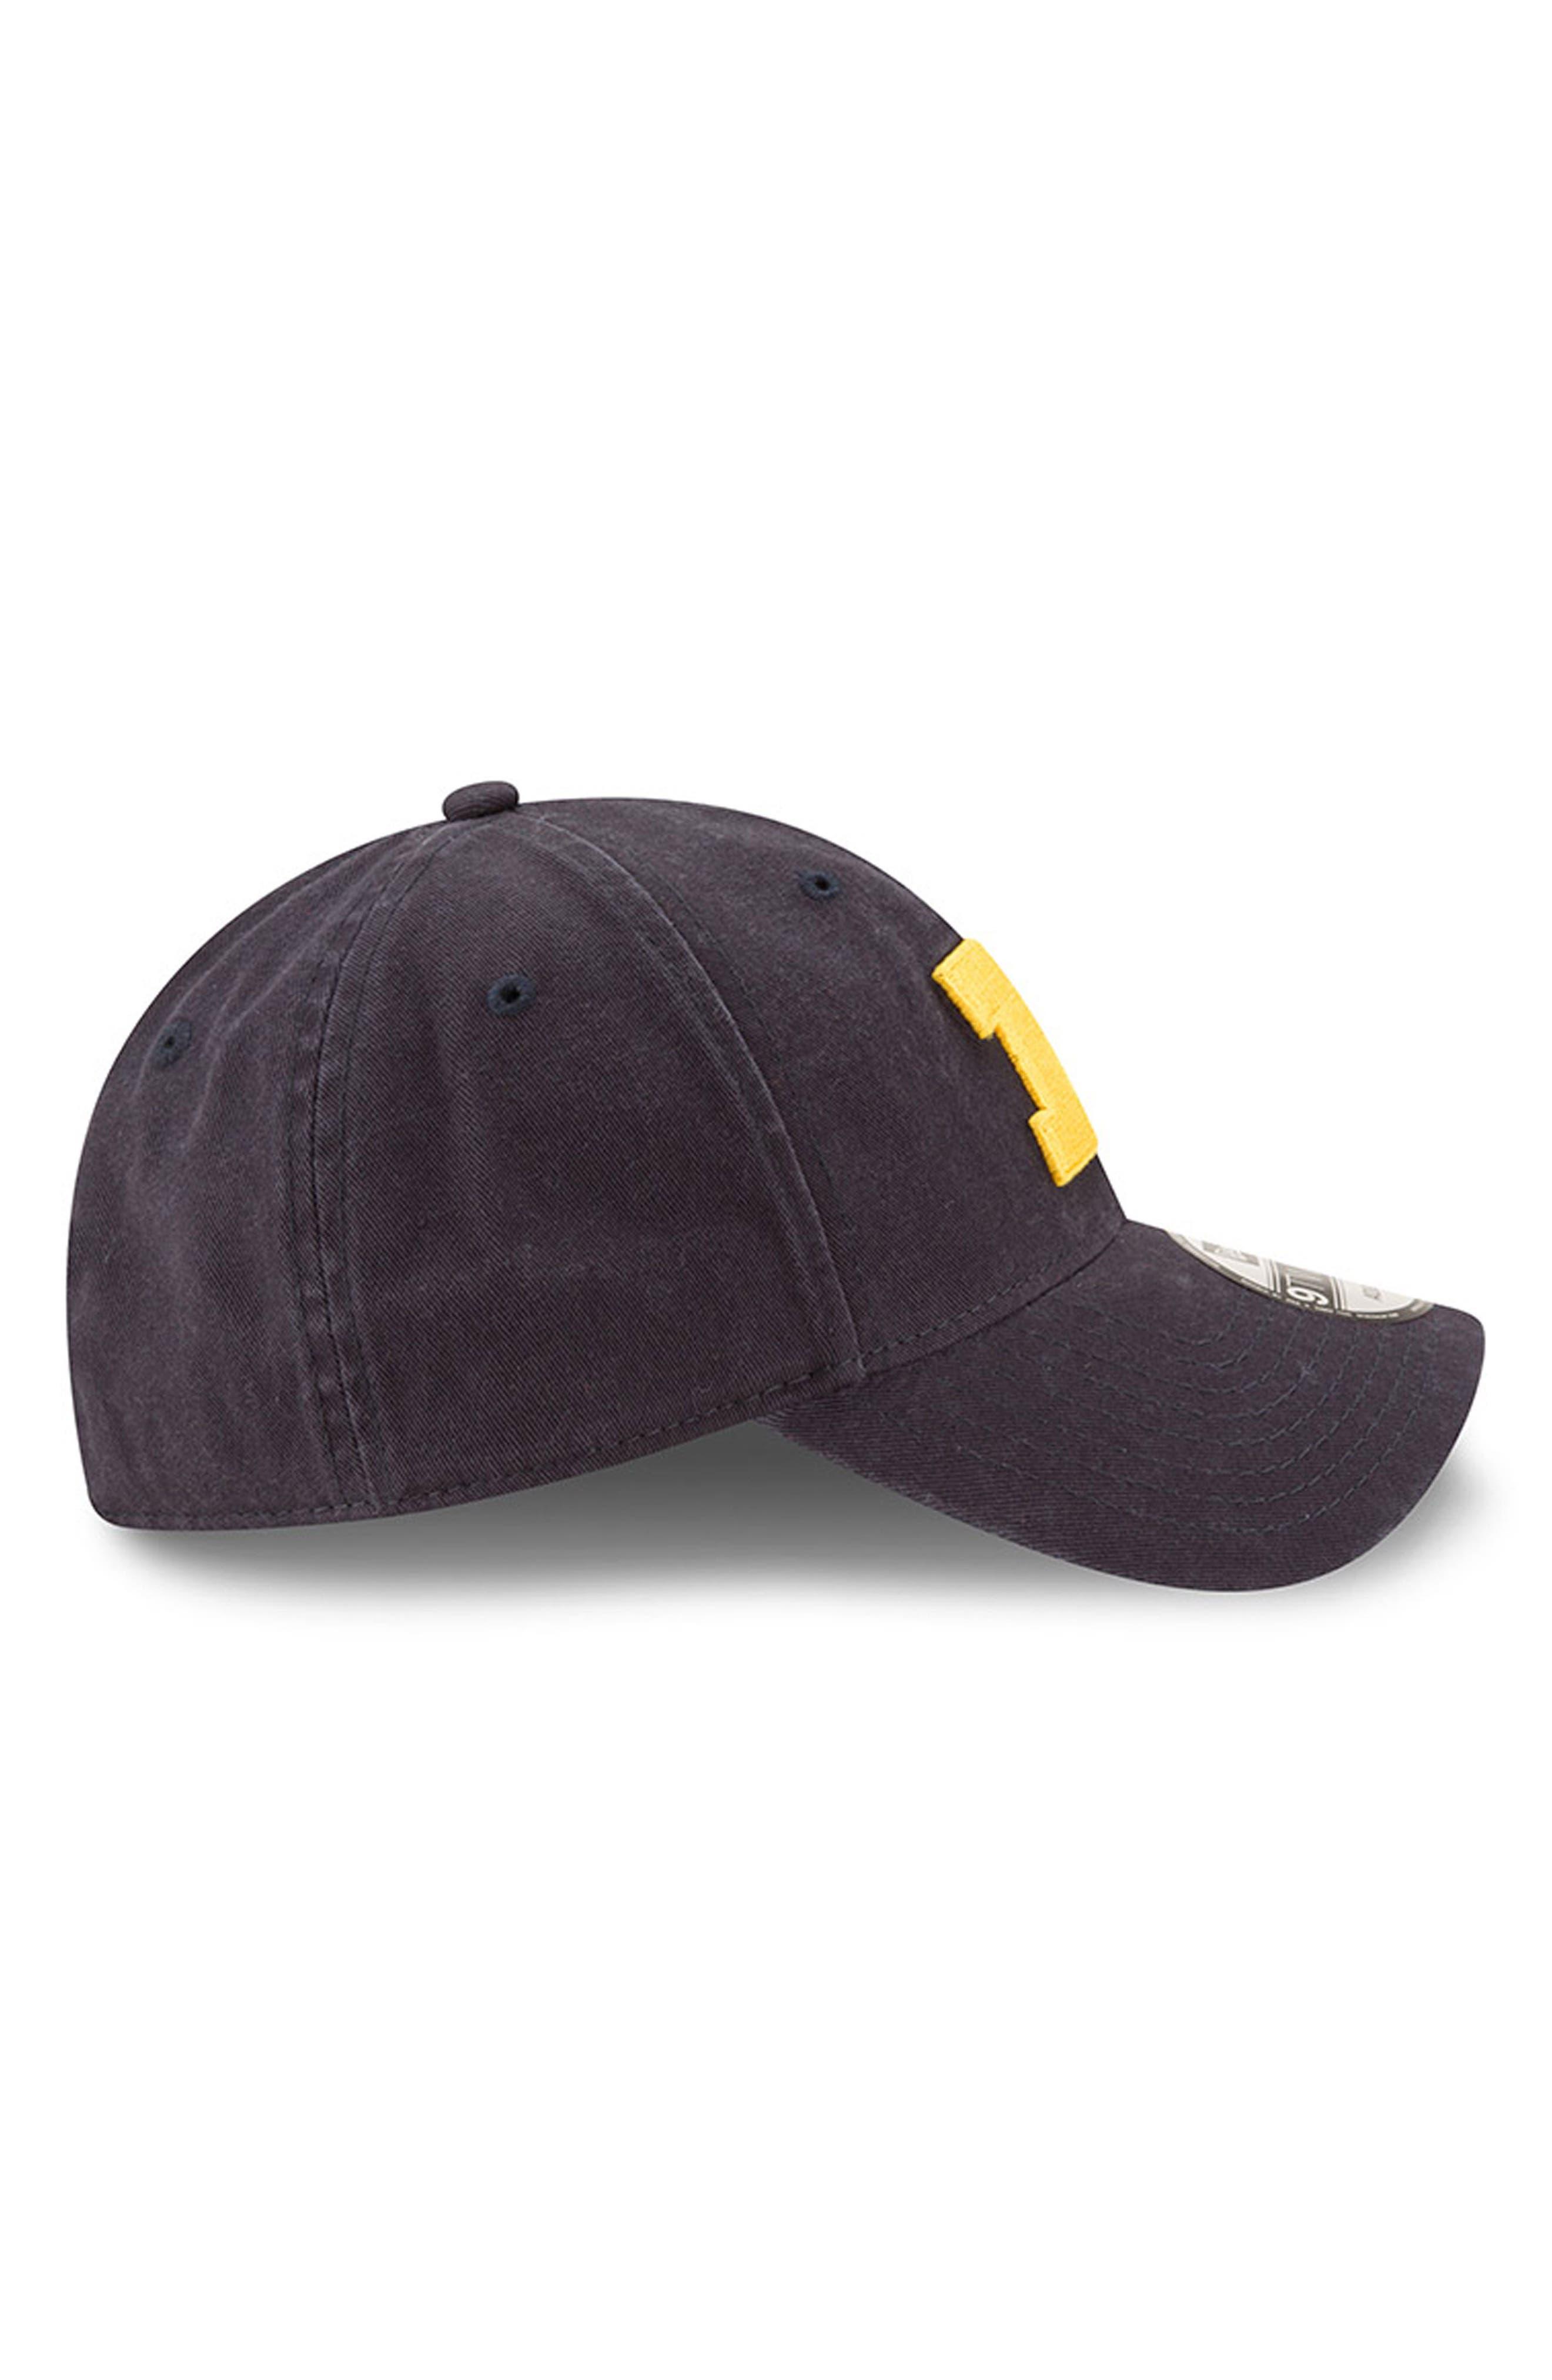 New Era Collegiate Core Classic - Michigan Wolverines Baseball Cap,                             Alternate thumbnail 4, color,                             410